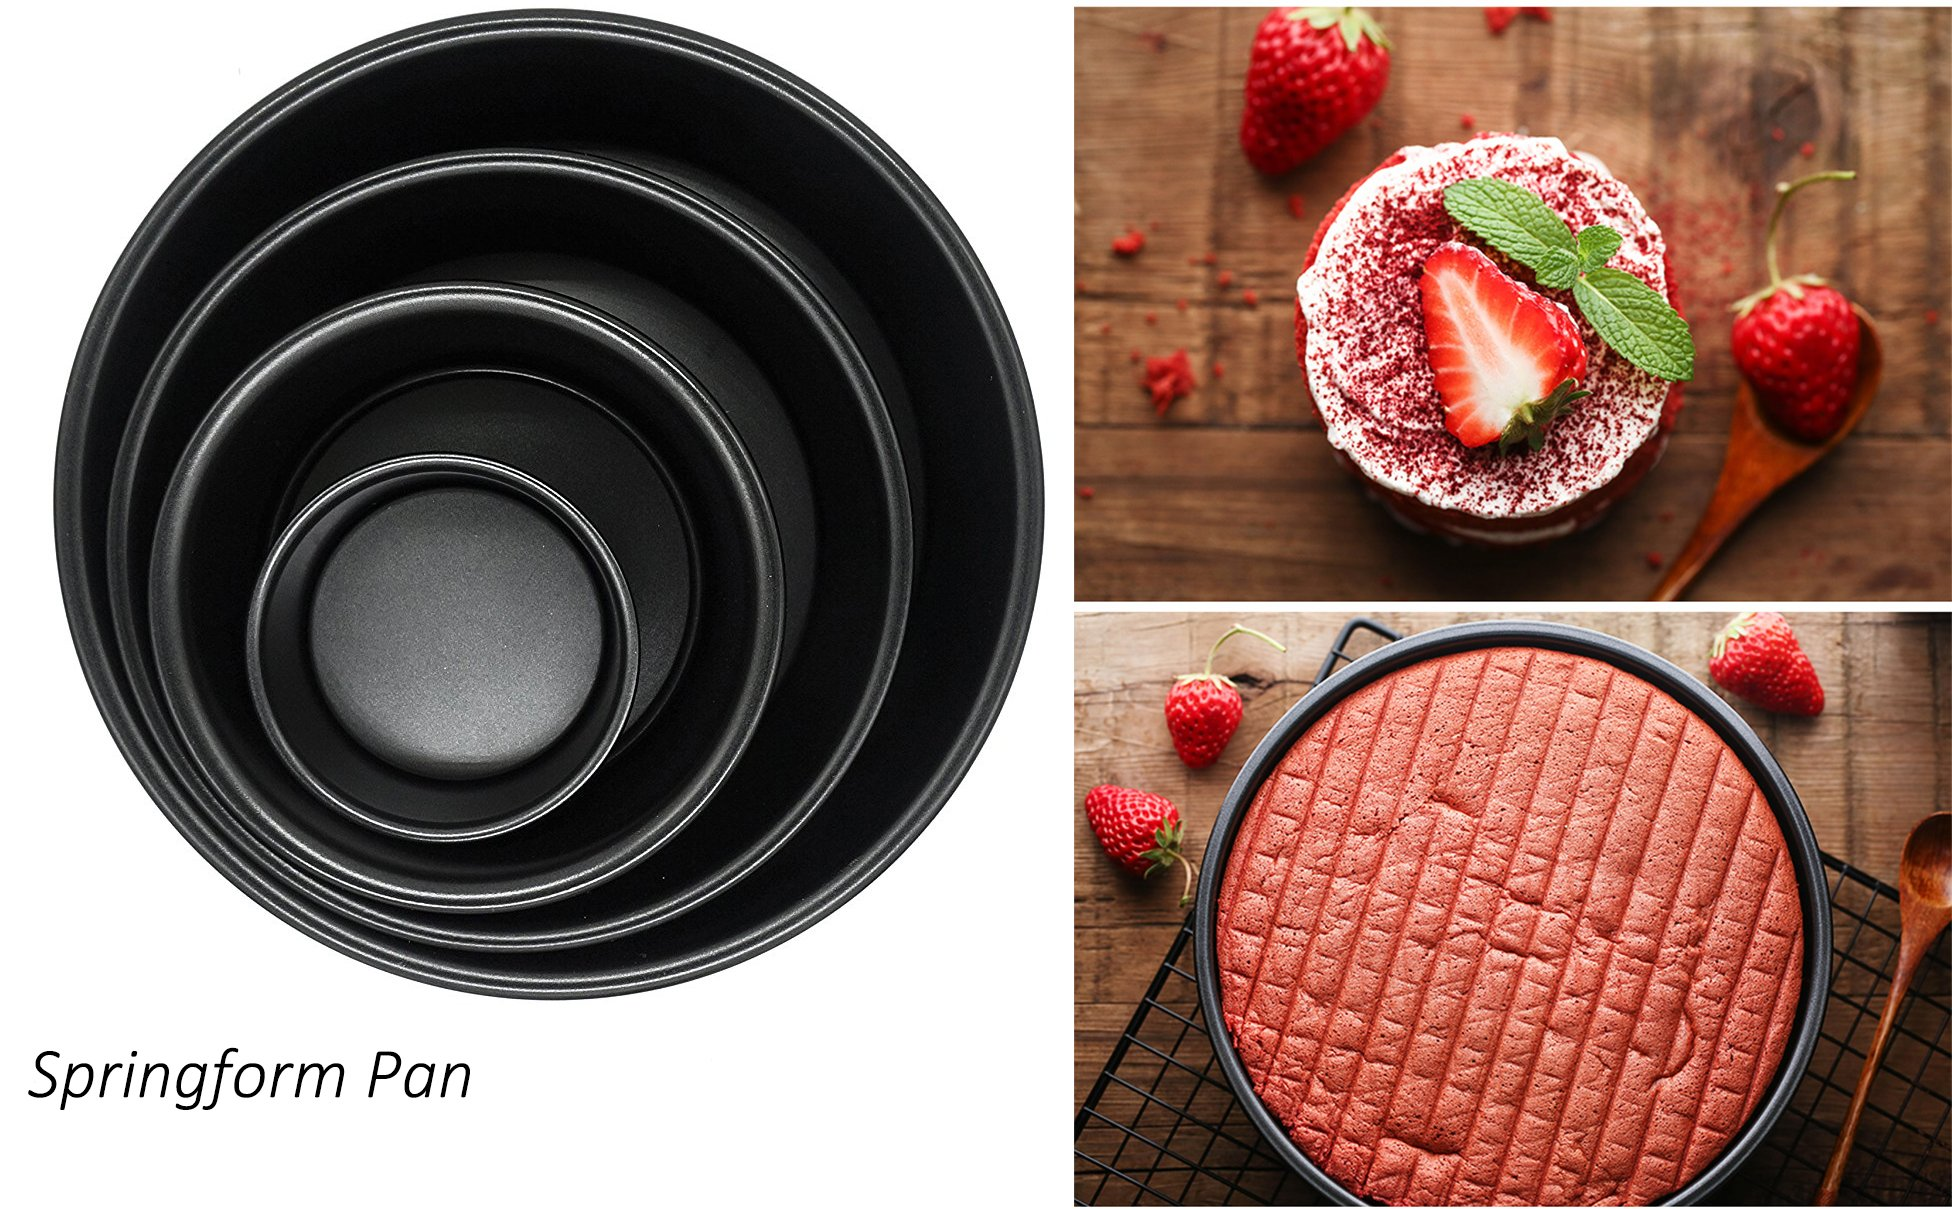 Blackcover Baking Pan Springform Pan Ideal for Bread Baking Made of Non-Stick Black Steel Bread Pan Set Cake Pan Bakeware Set (Round 6'')